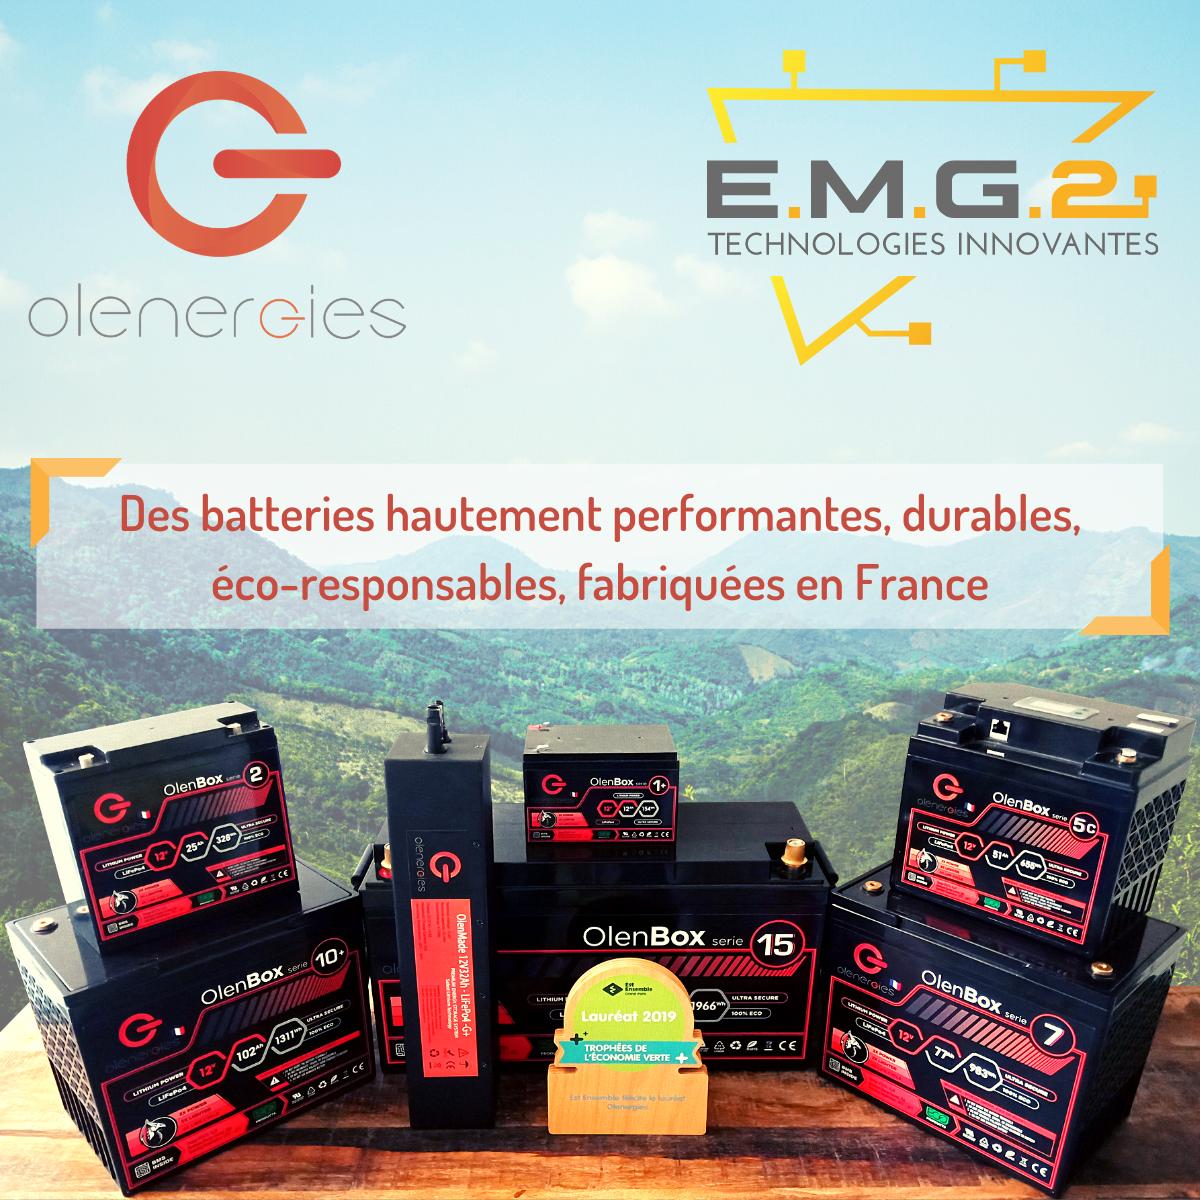 Olenergies Batteries